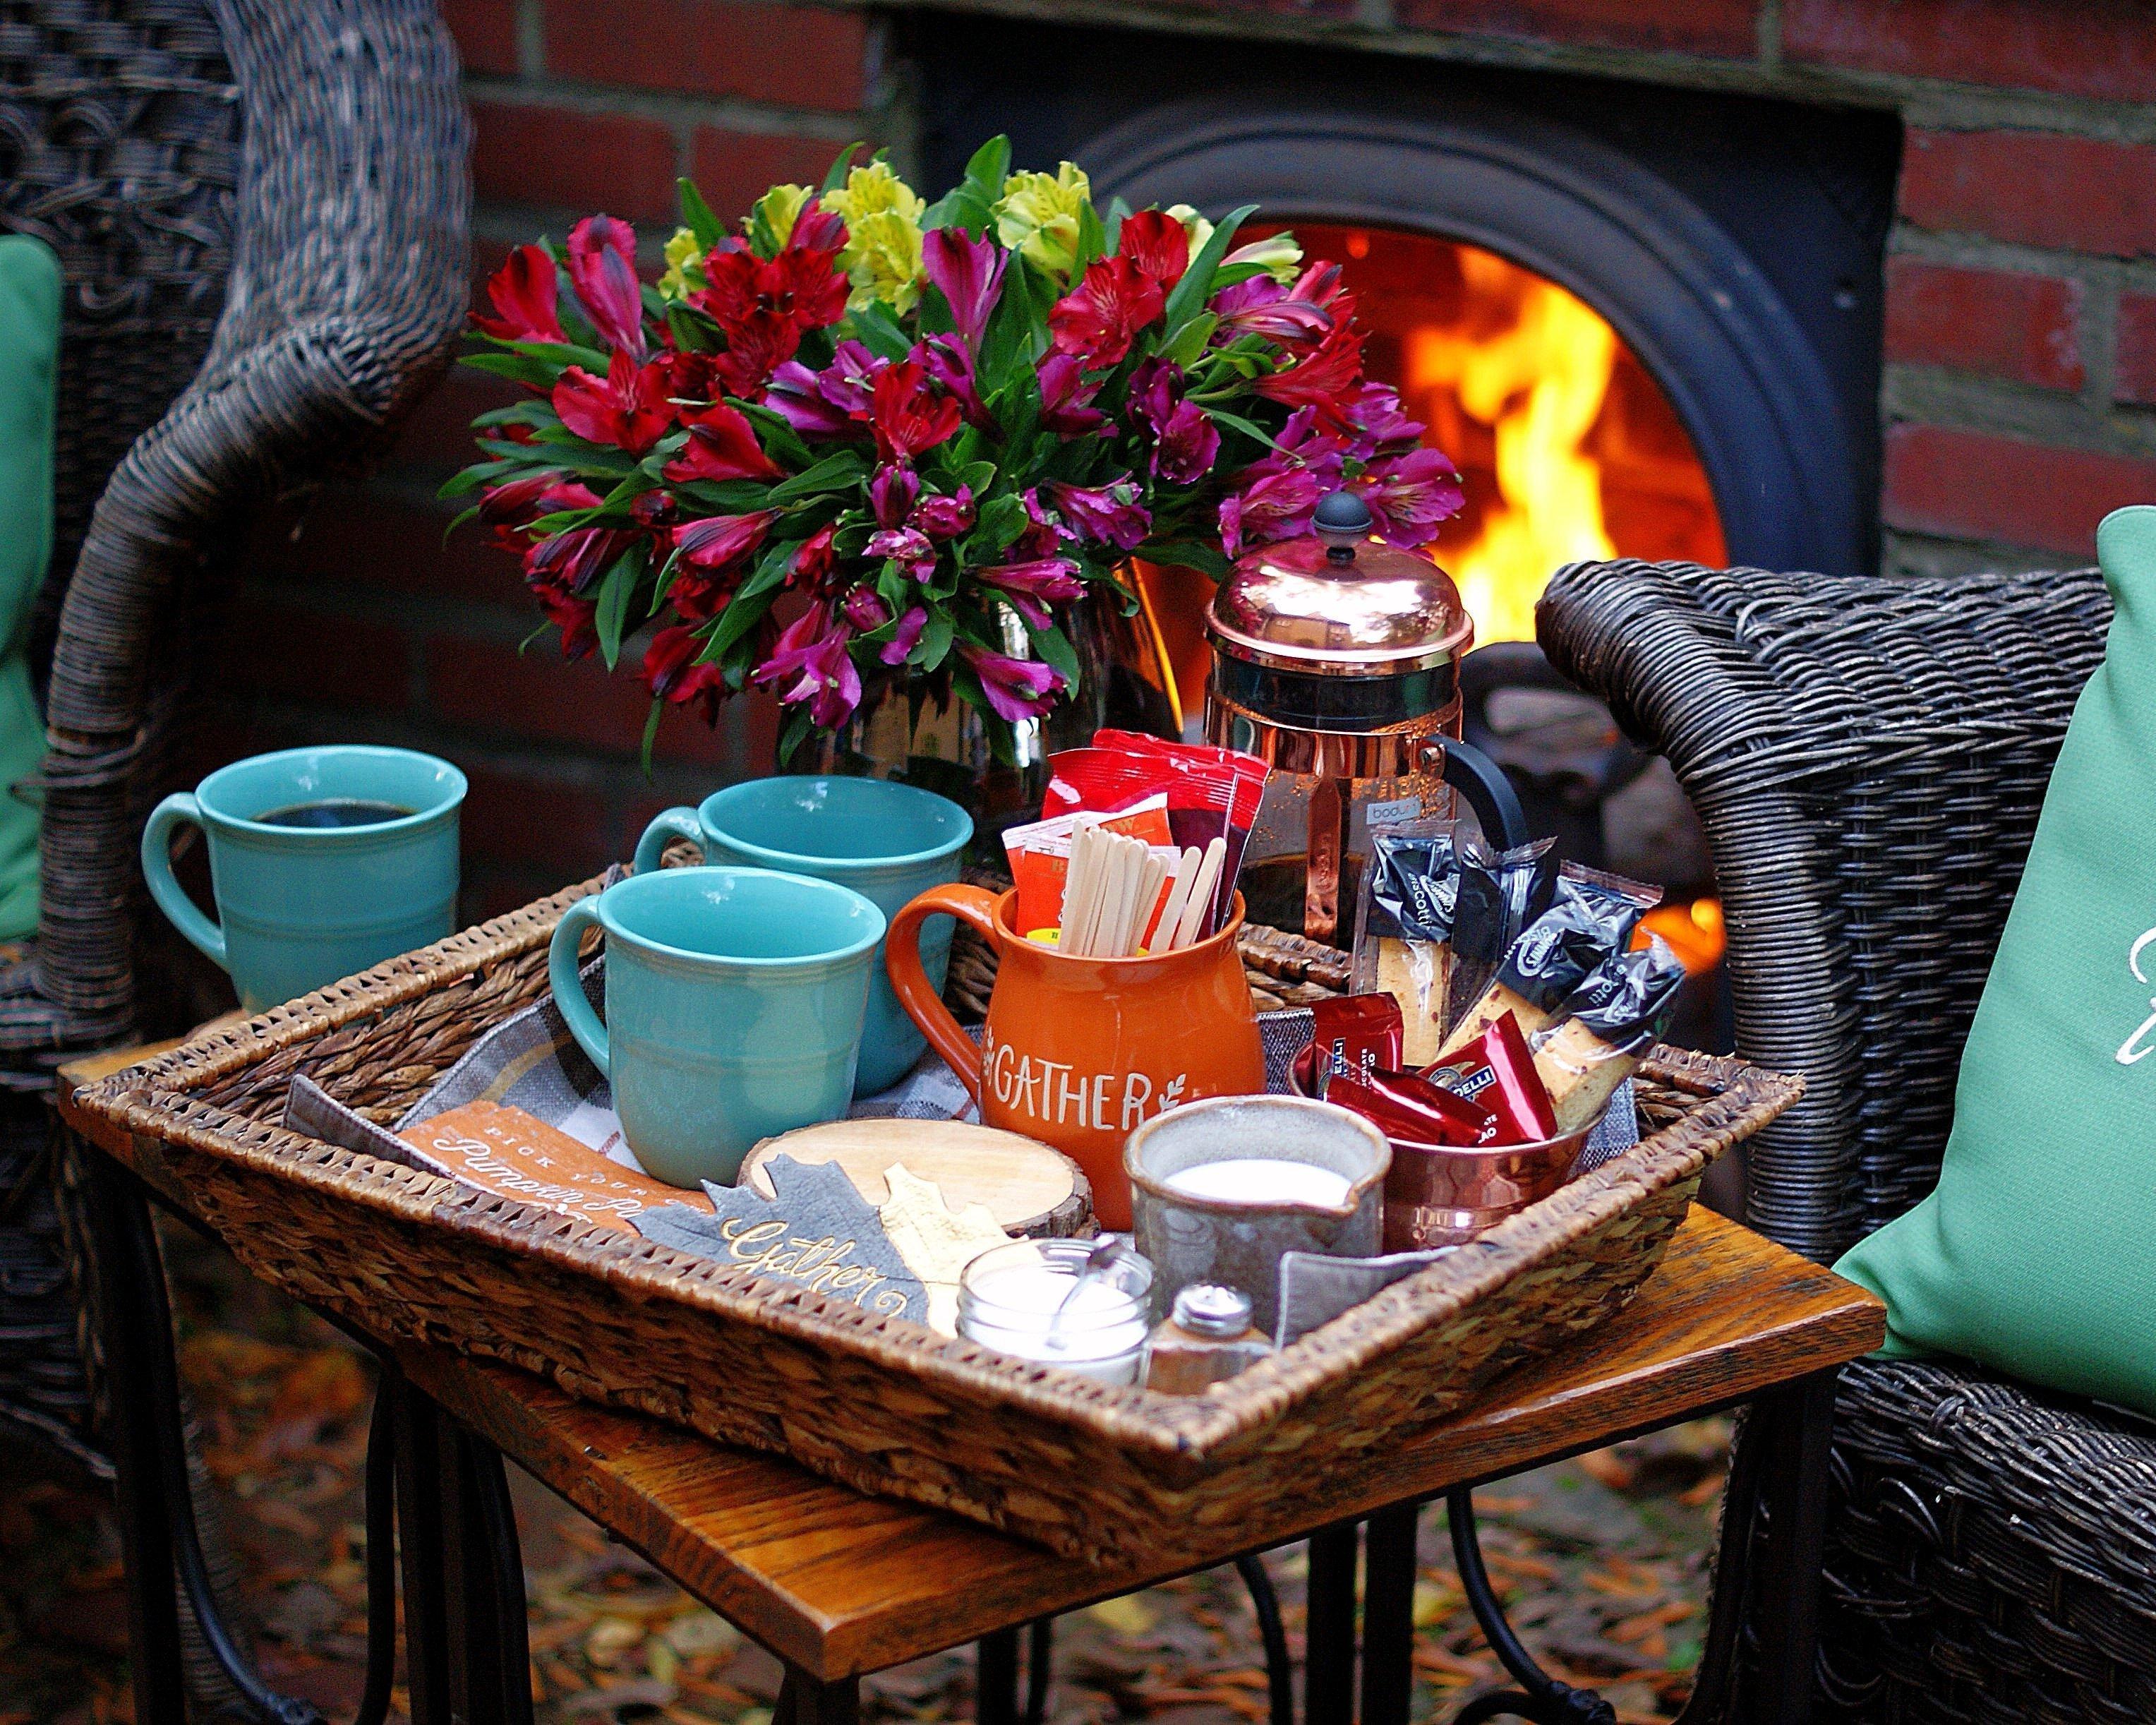 Coffee Station with basic coffee needs.